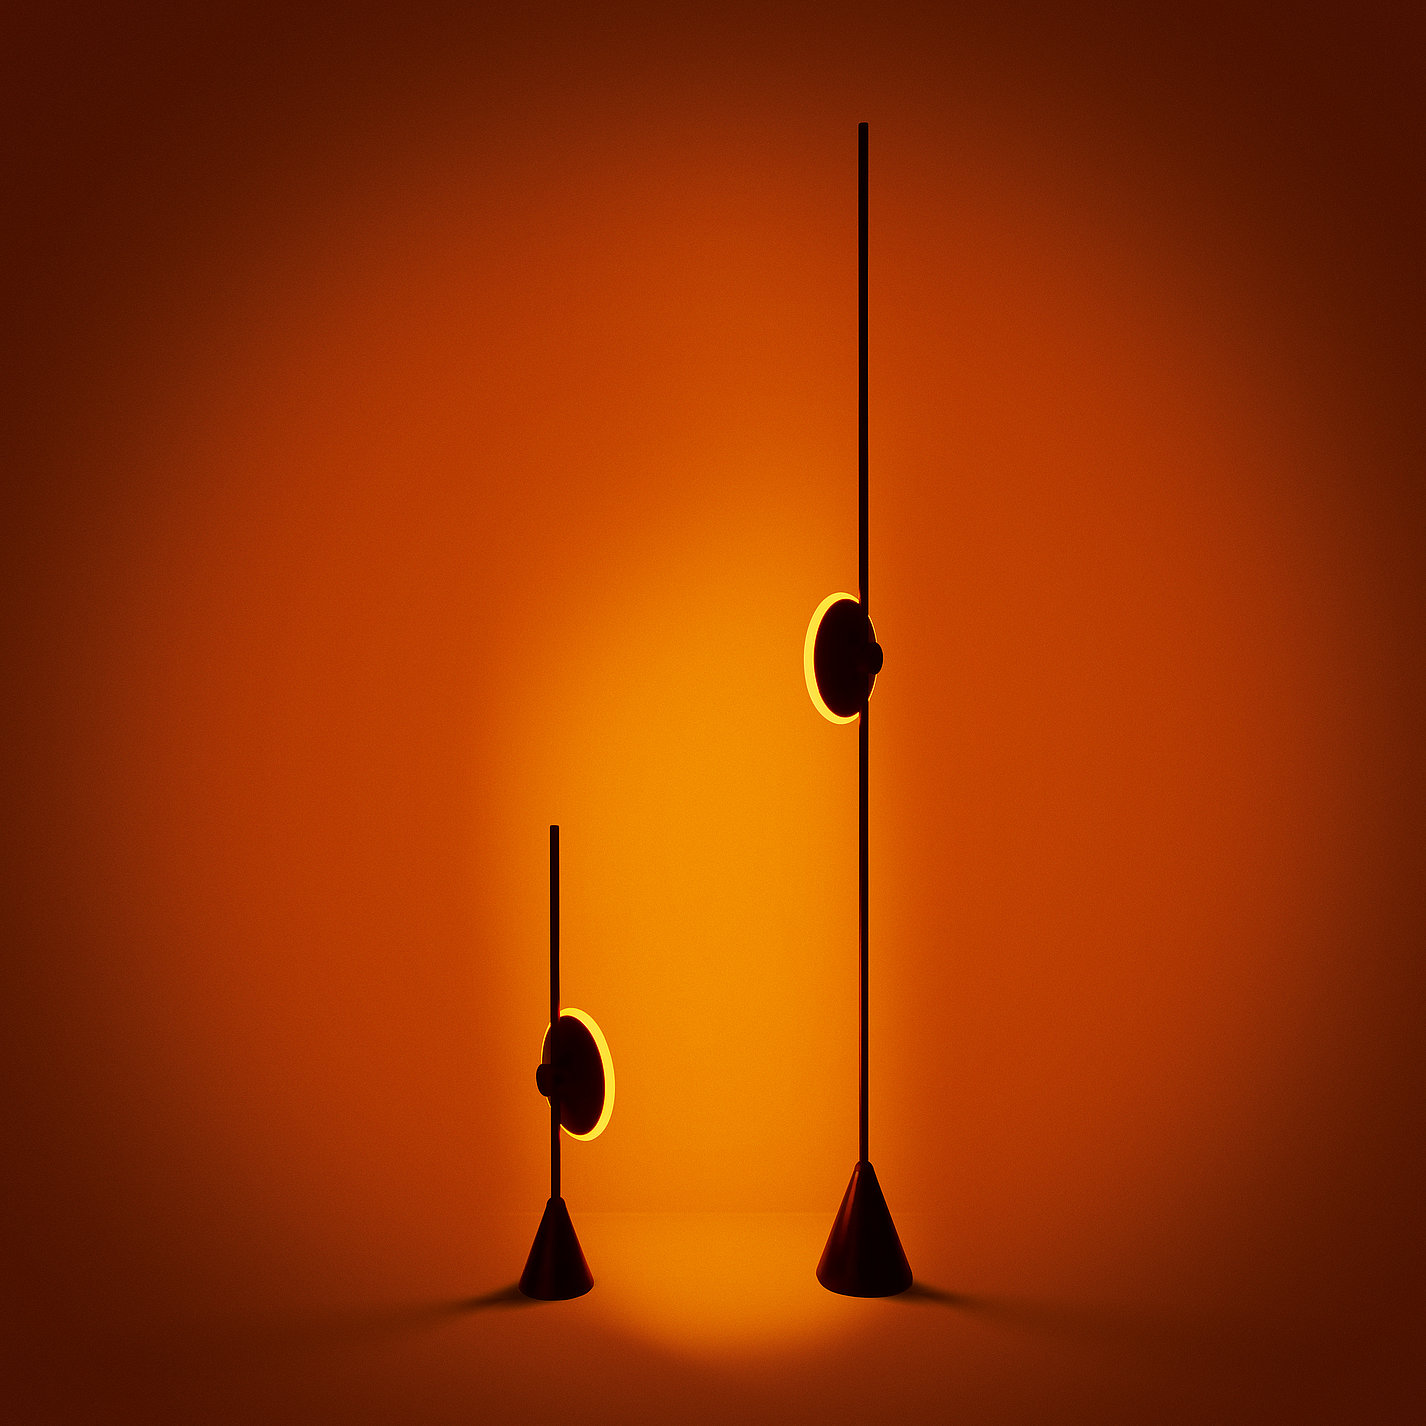 Dawn to Dusk | Red Dot Design Award